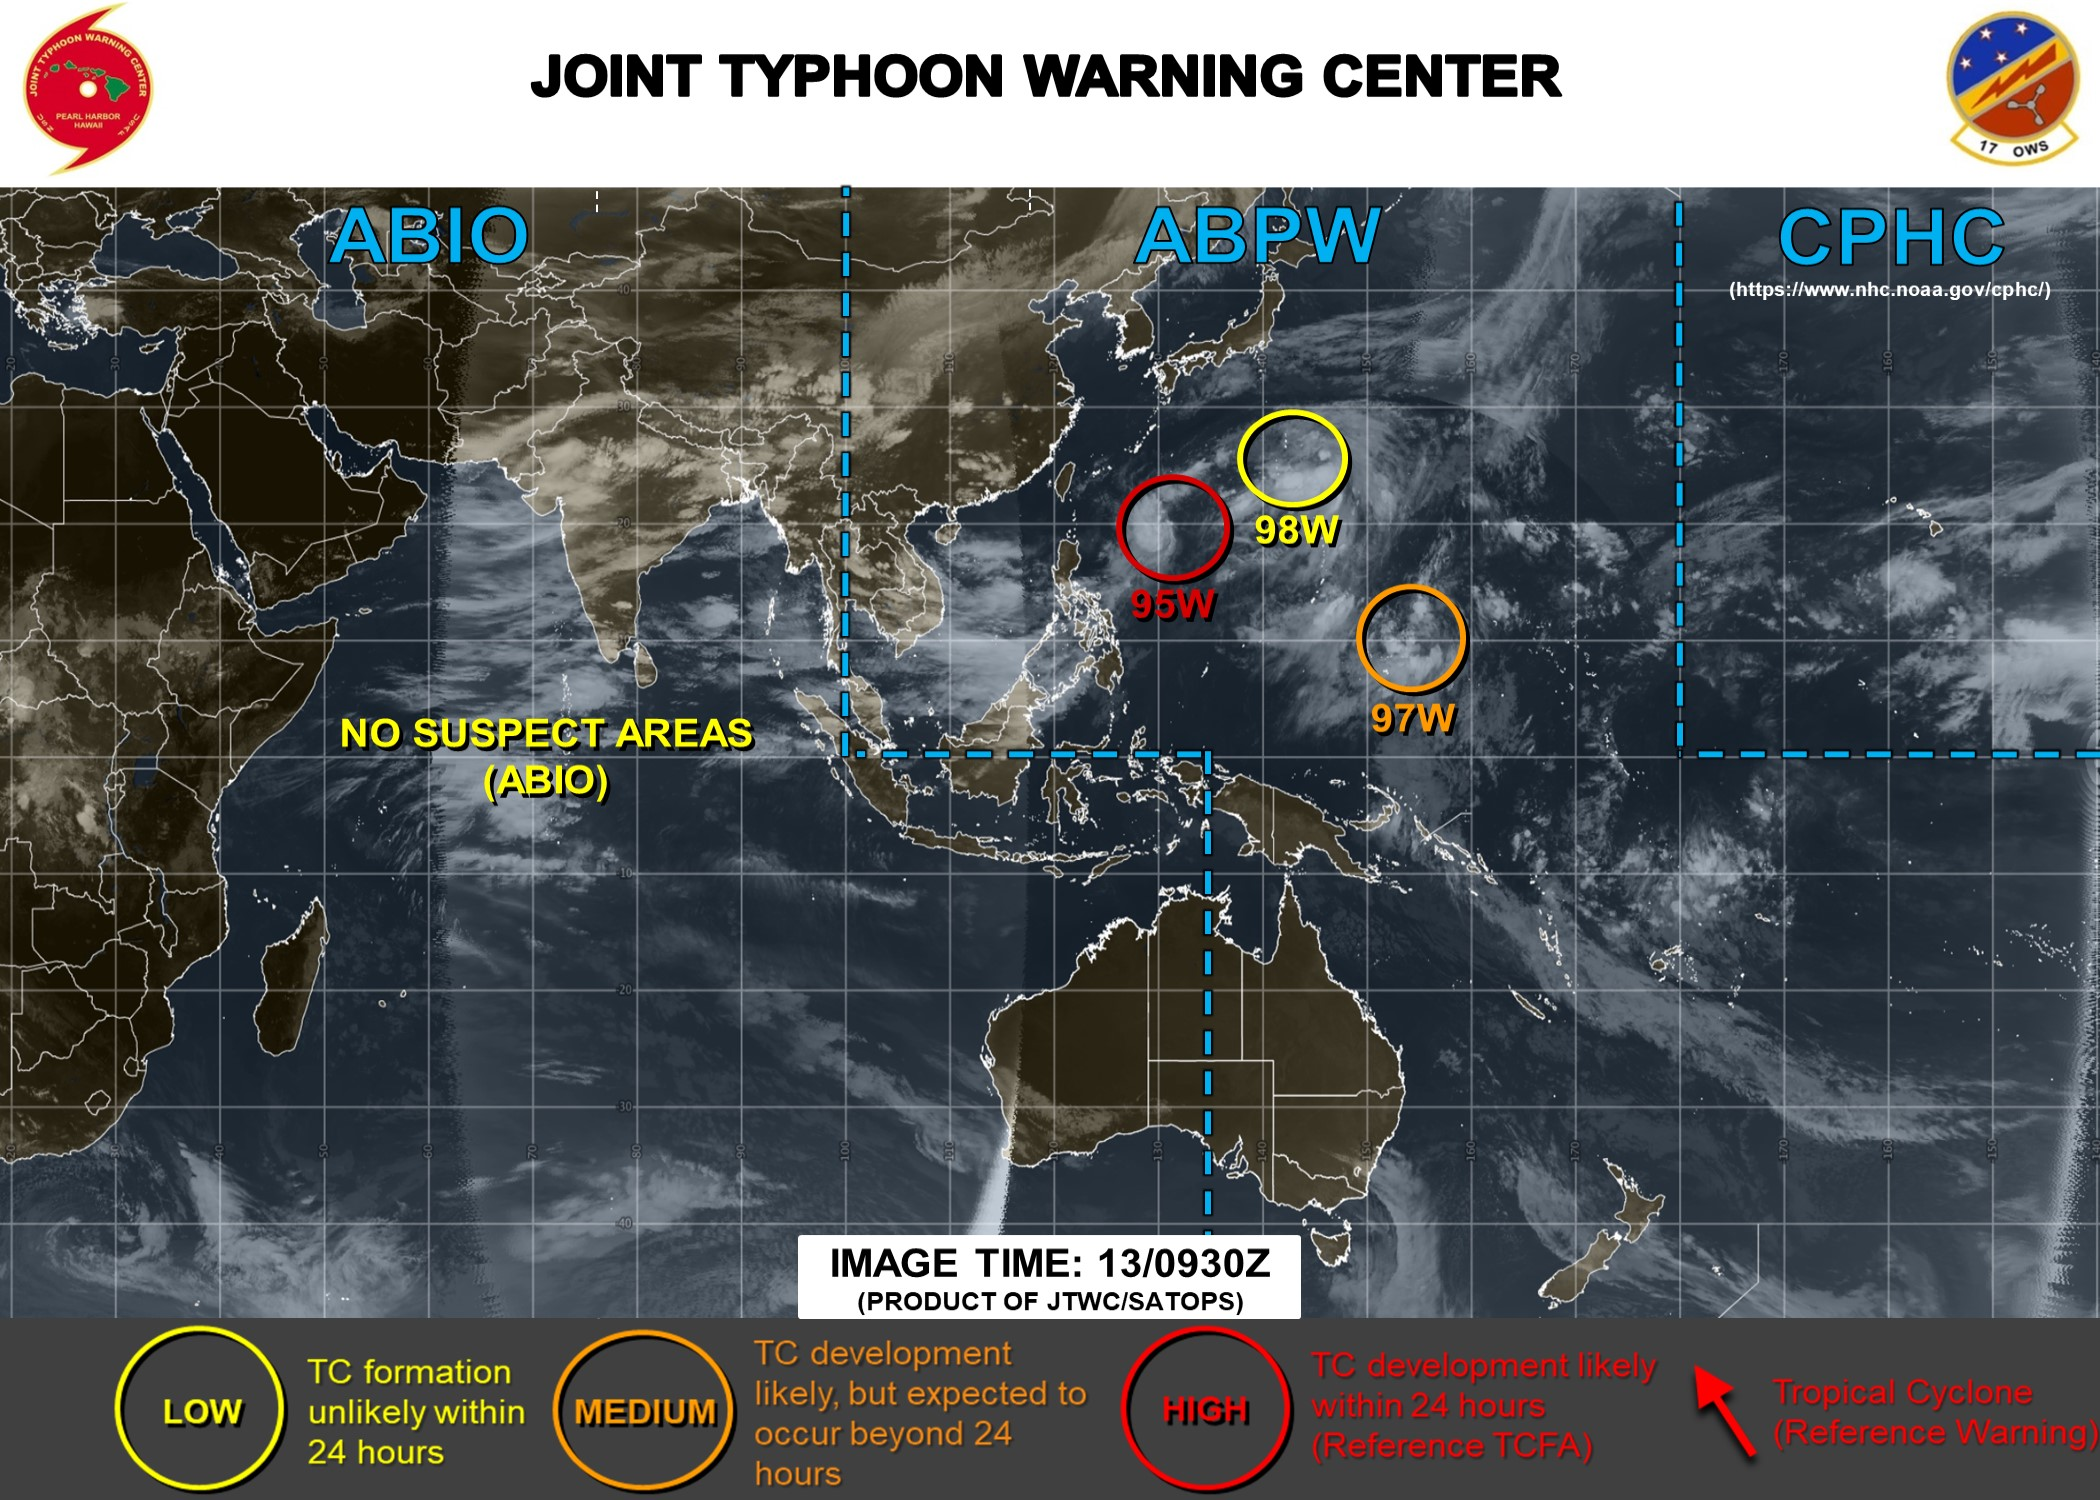 Invest 95W: Tropical Cyclone formation Alert.  97W: Medium